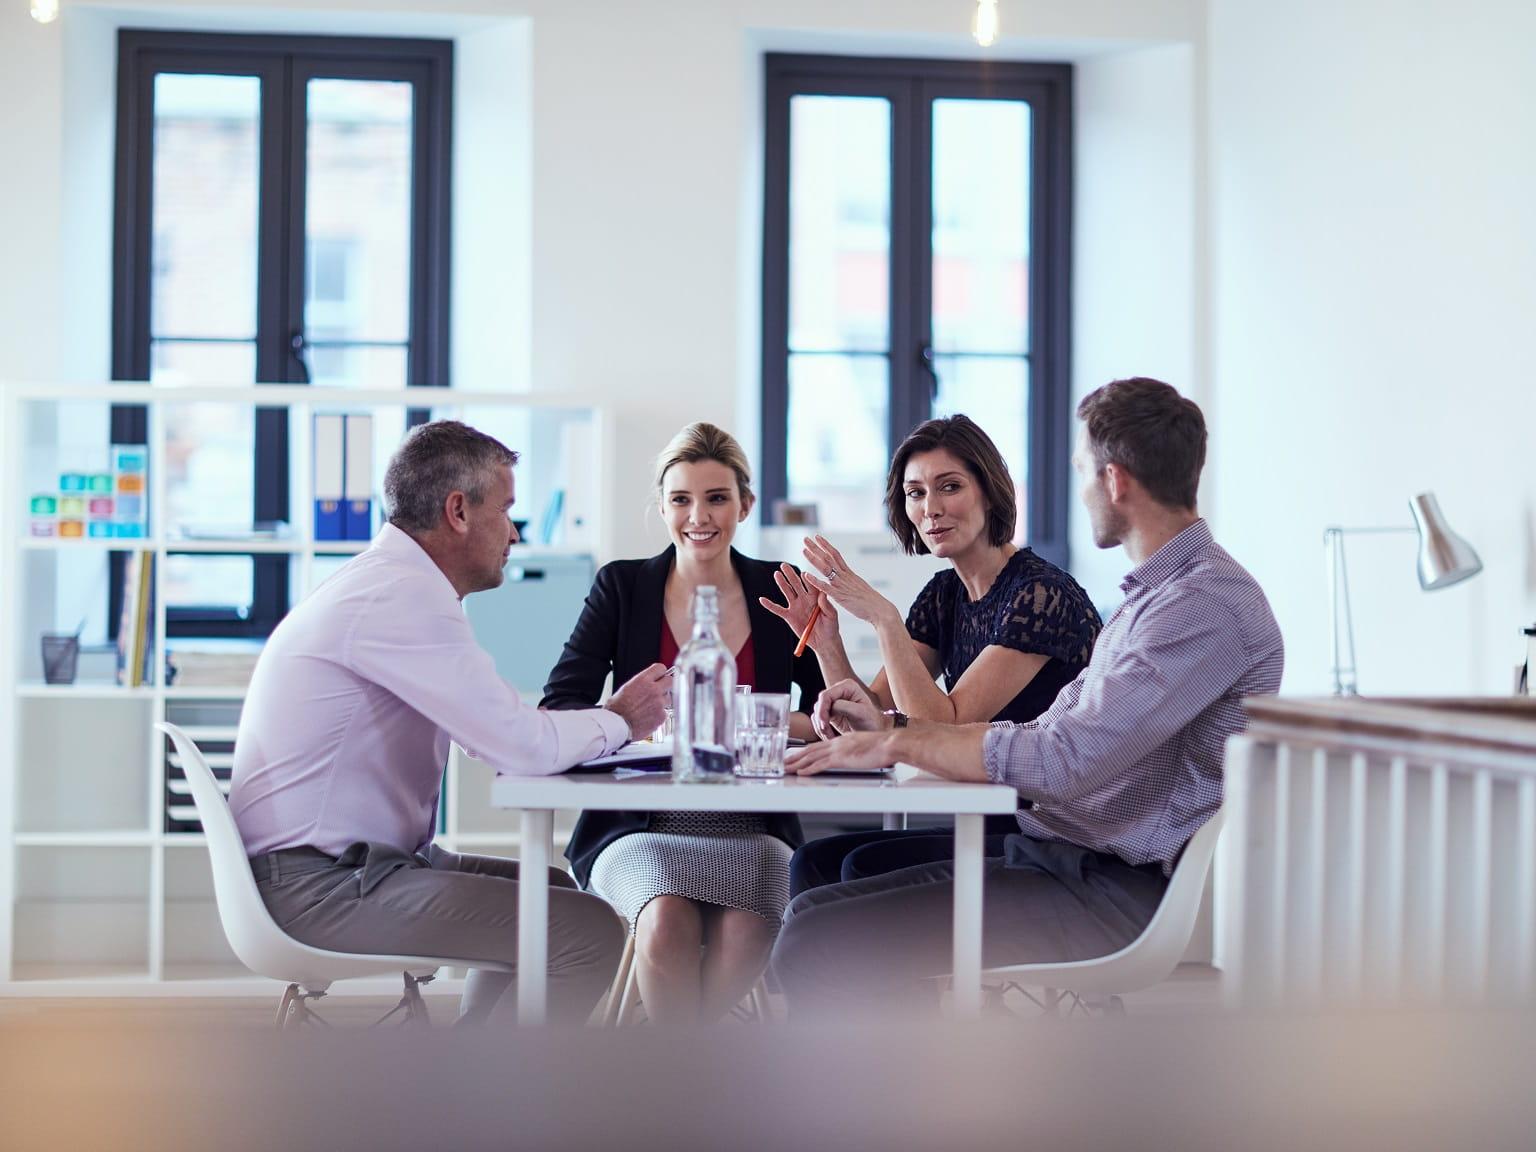 Meeting tra quattro colleghi in ufficio